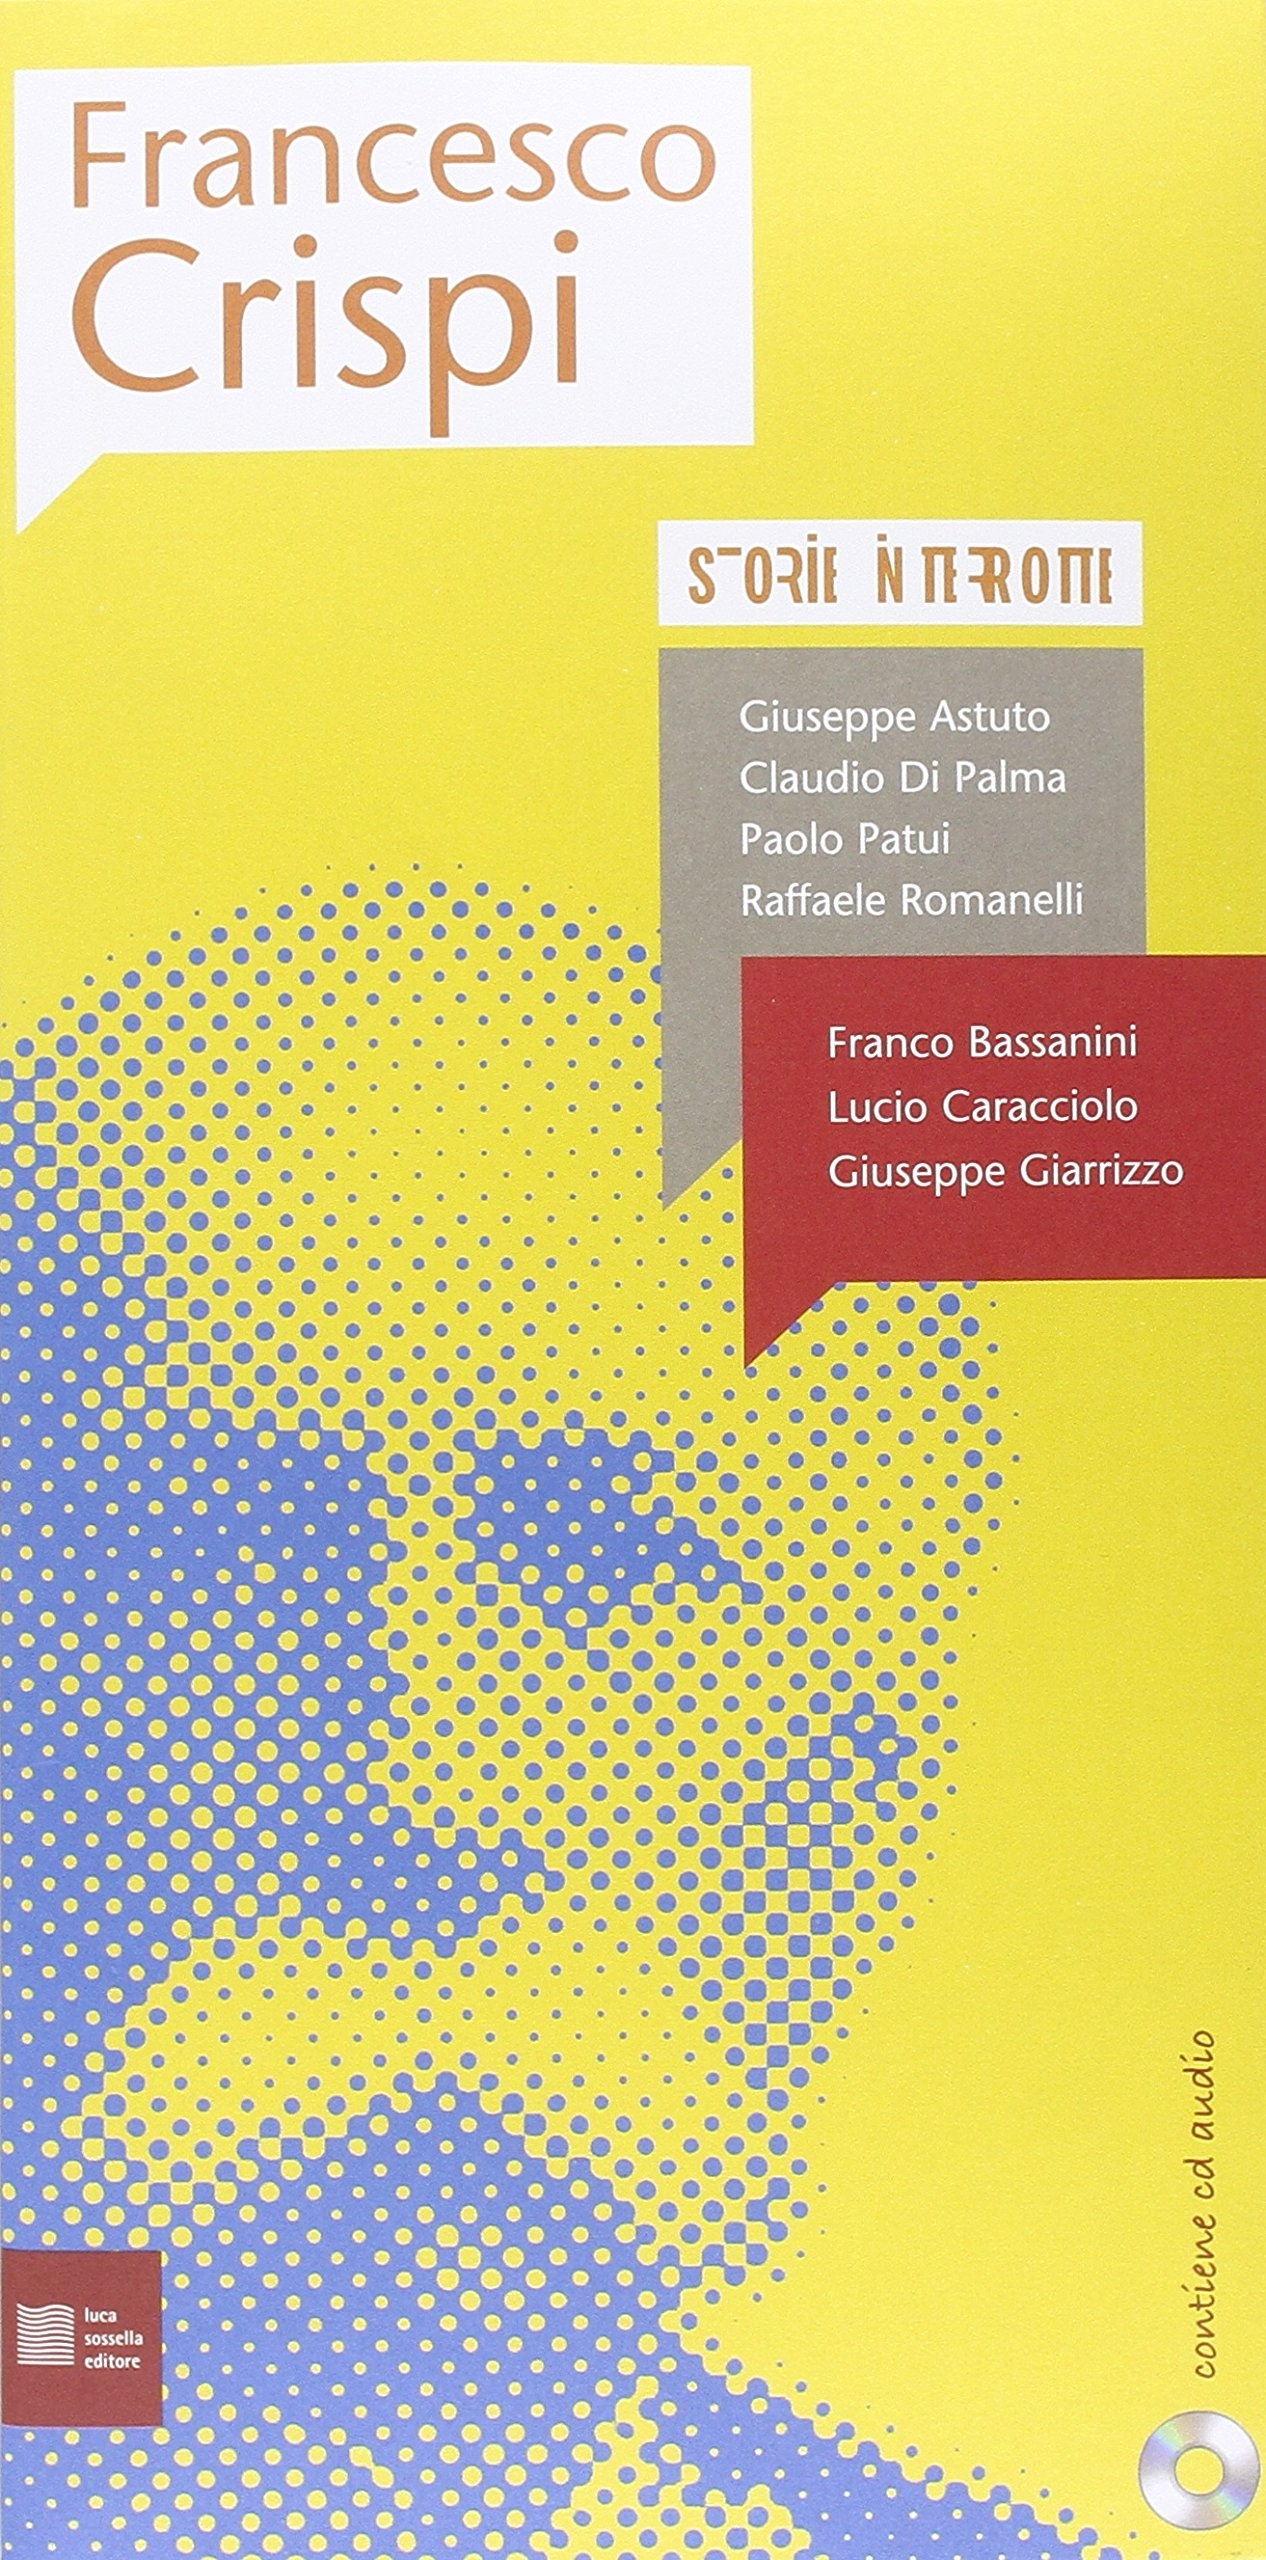 Francesco Crispi. Storie interrotte. Con CD Audio.